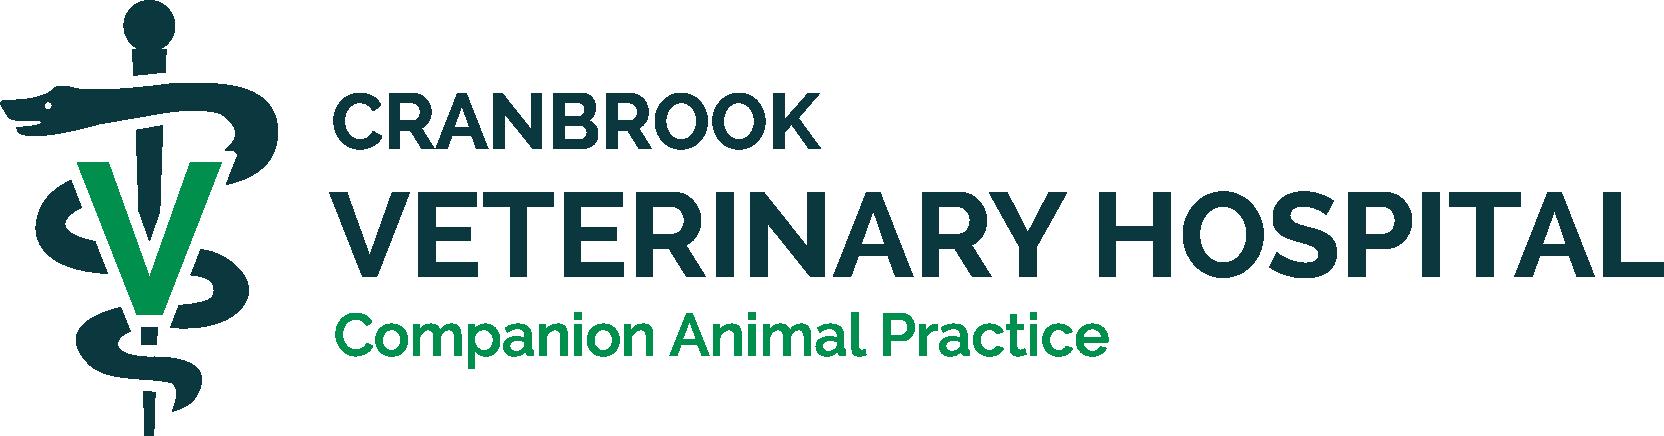 Cranbrook Veterinary Hospital